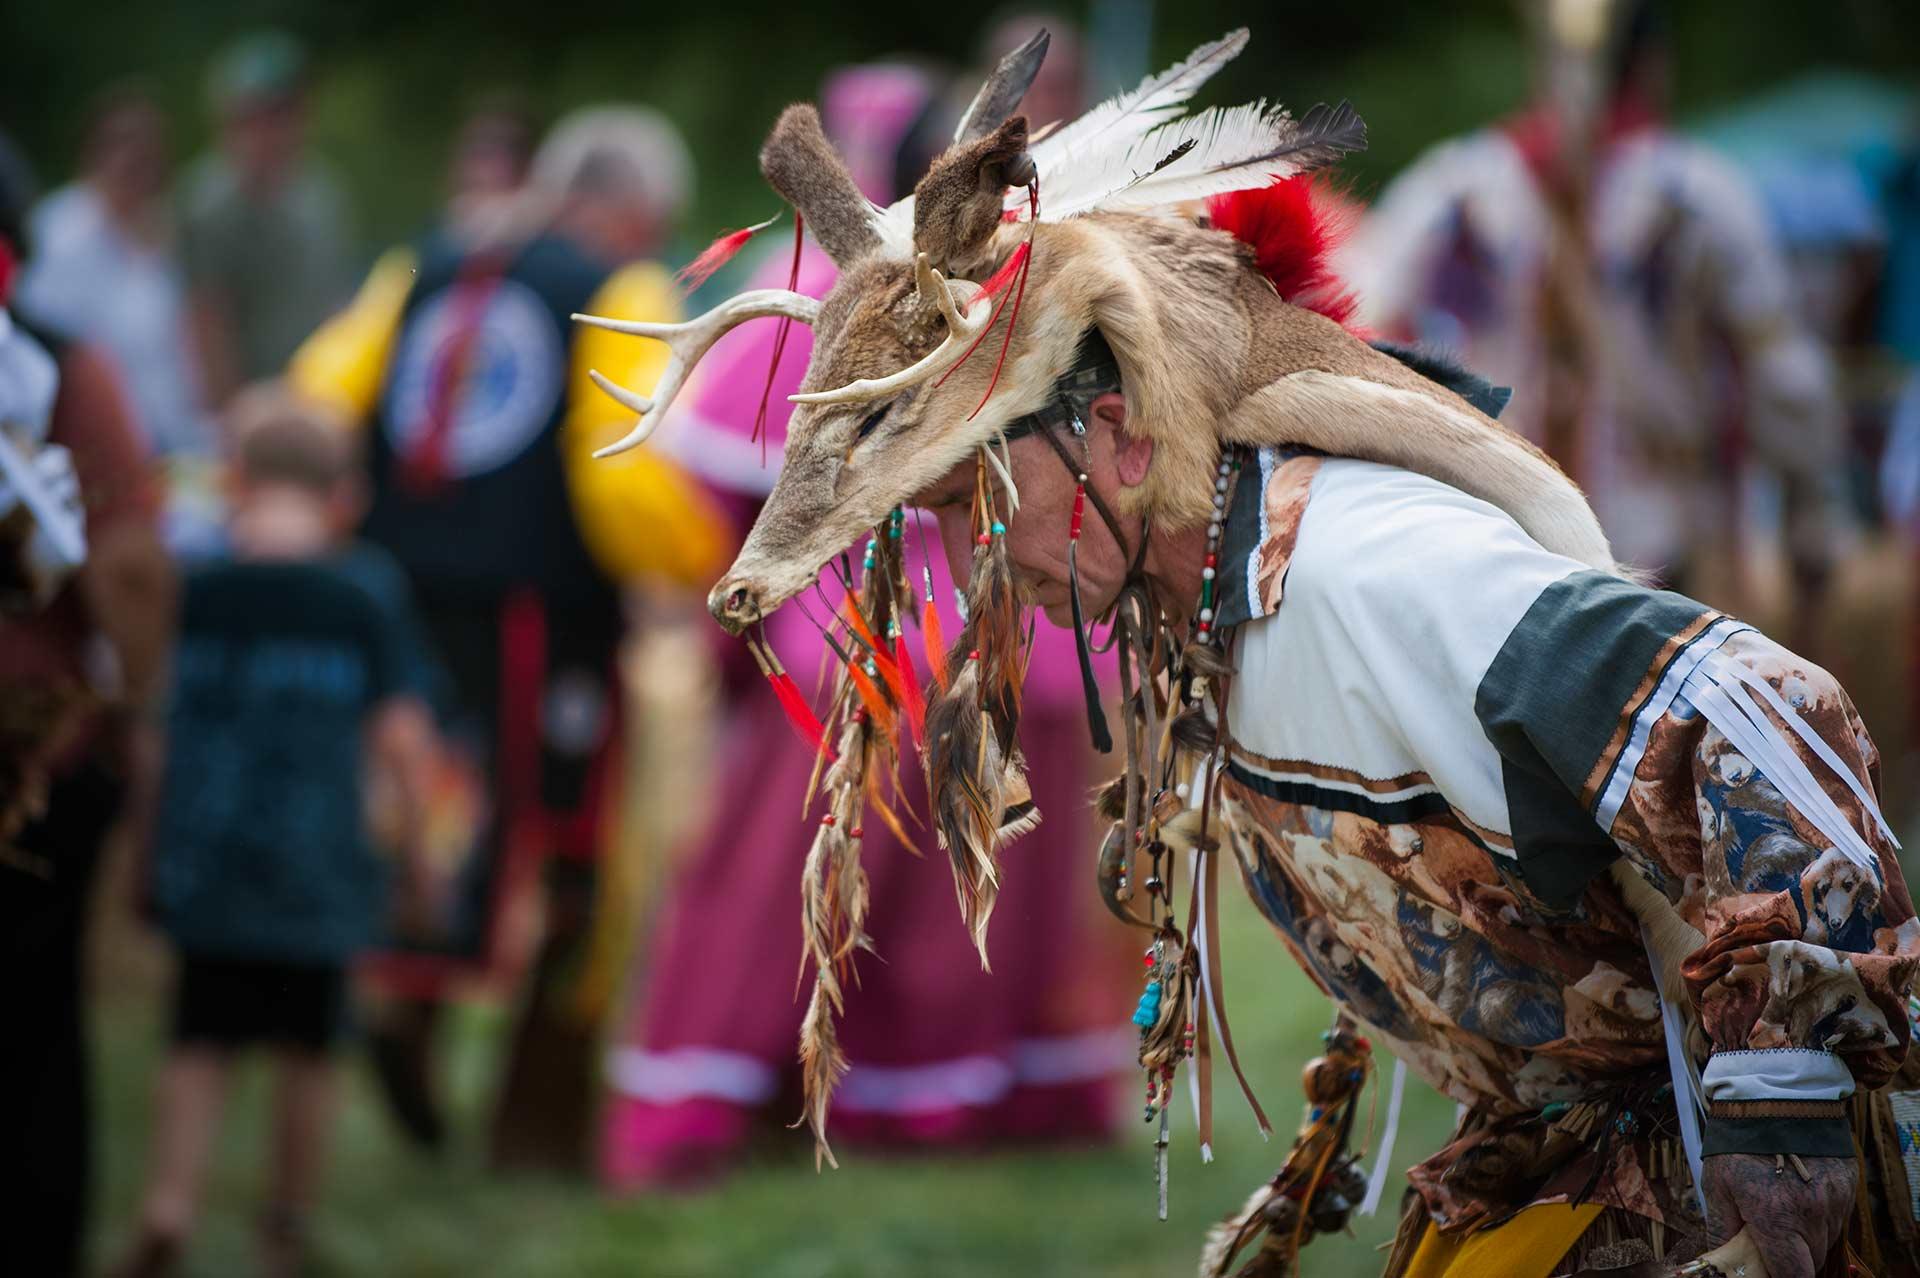 Native American Pow-Wow regalia at the Muddy Run Pow-Wow at Muddy run Park in Holtwood Pennsylvania